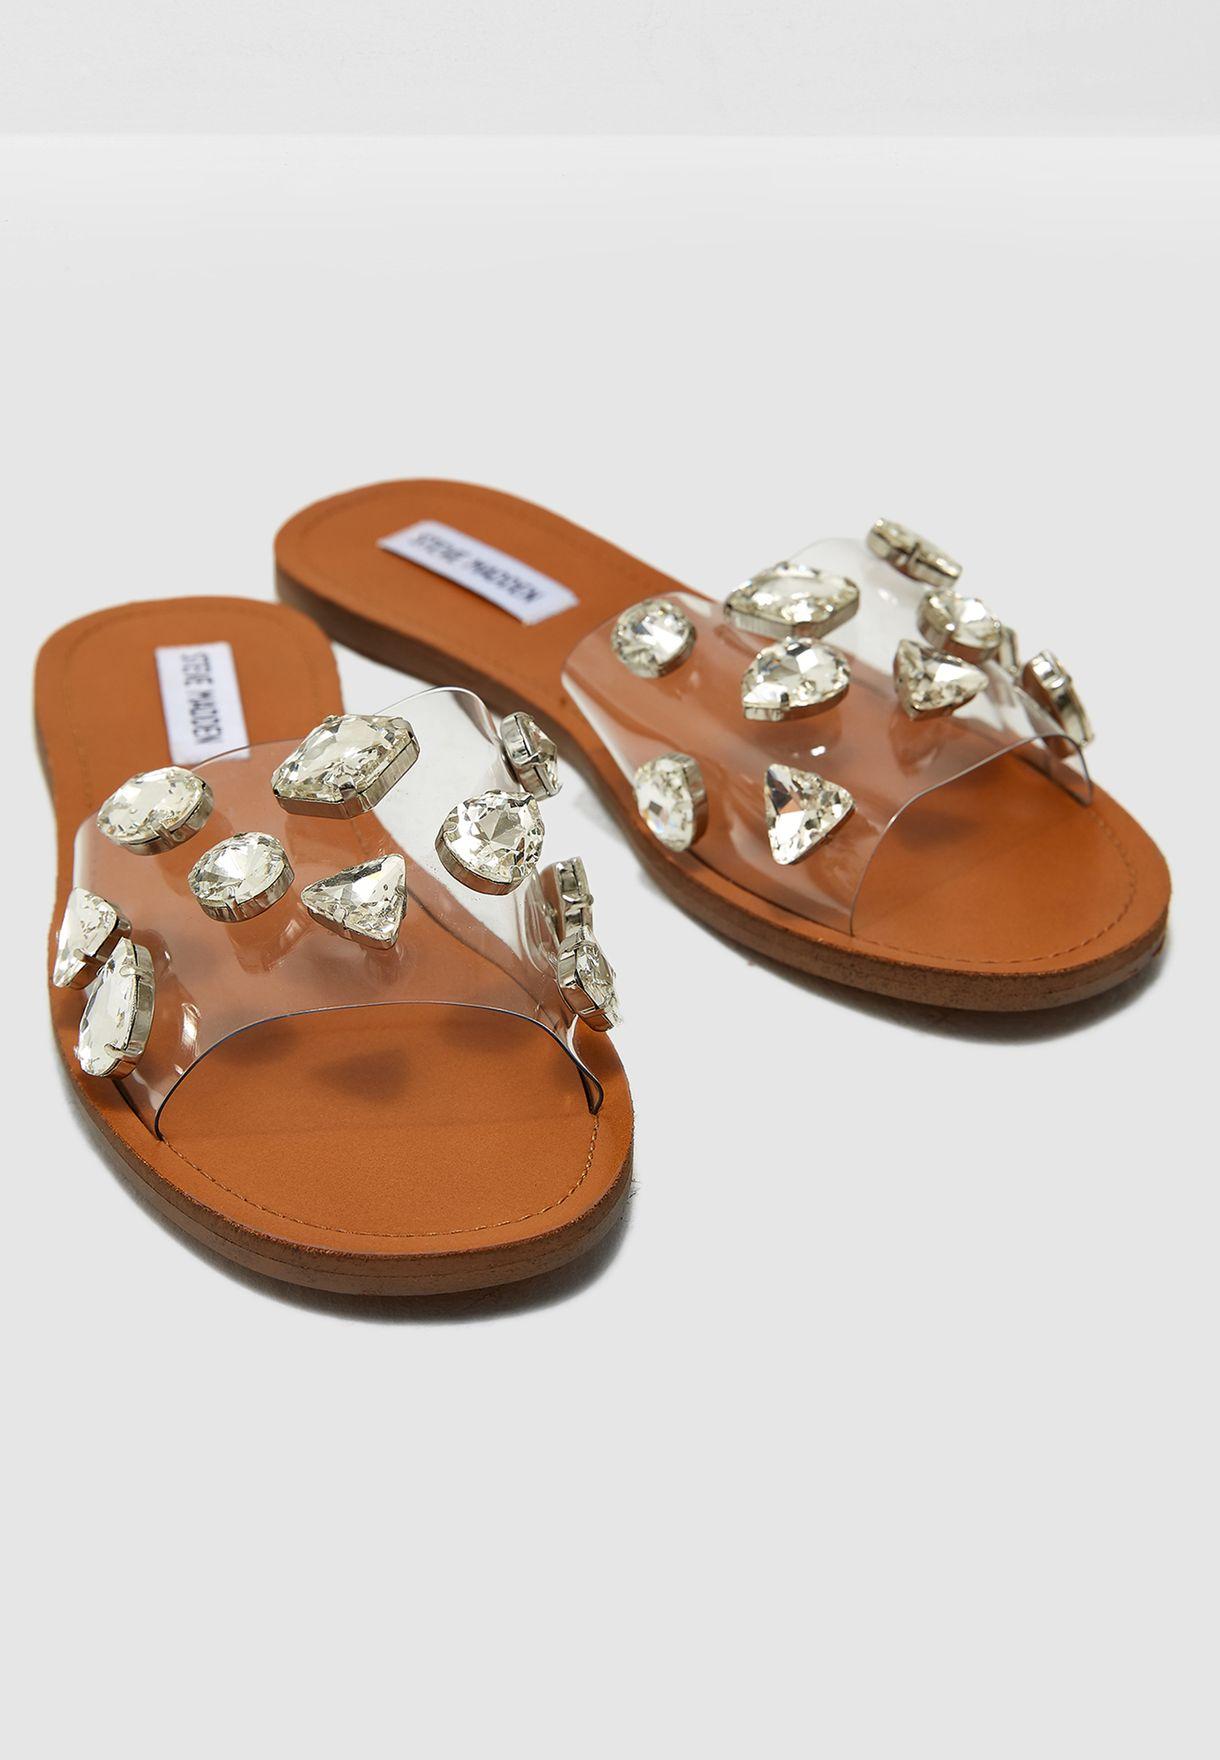 8a77c2235 Shop Steve Madden multicolor Rosalyn Flat Sandal ROSALYN for Women ...